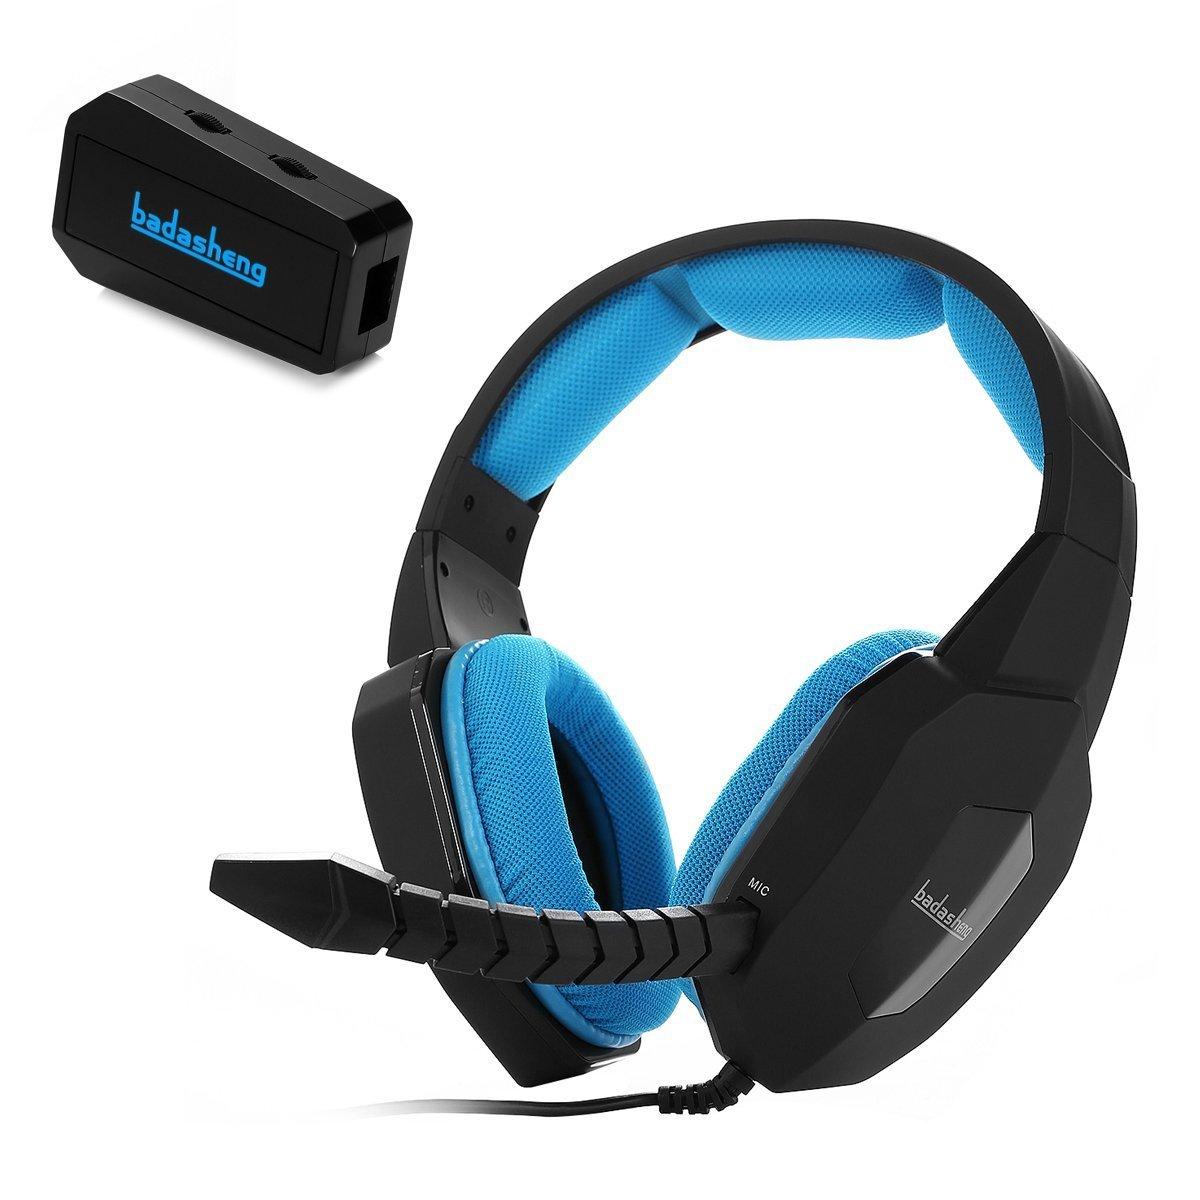 Amazon.com: Badasheng Multi-platform Stereo Sound Gaming Headset BDS ...